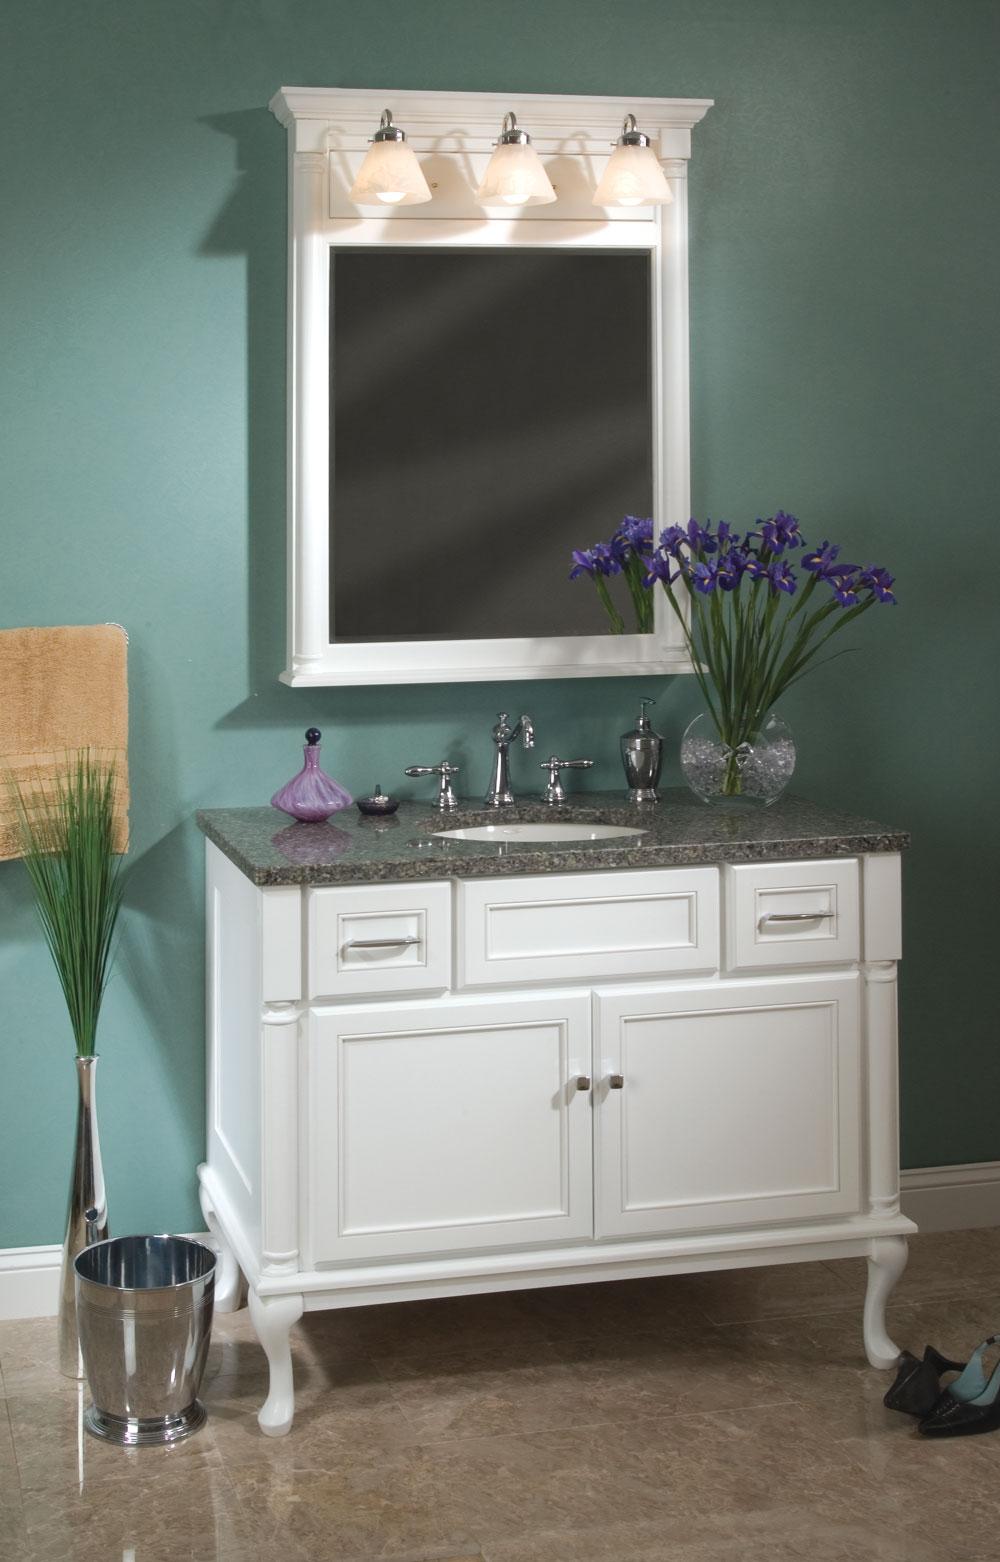 Premier cabinet series nottingham dresser vanity ensemble - Preston hardware bathroom vanities ...